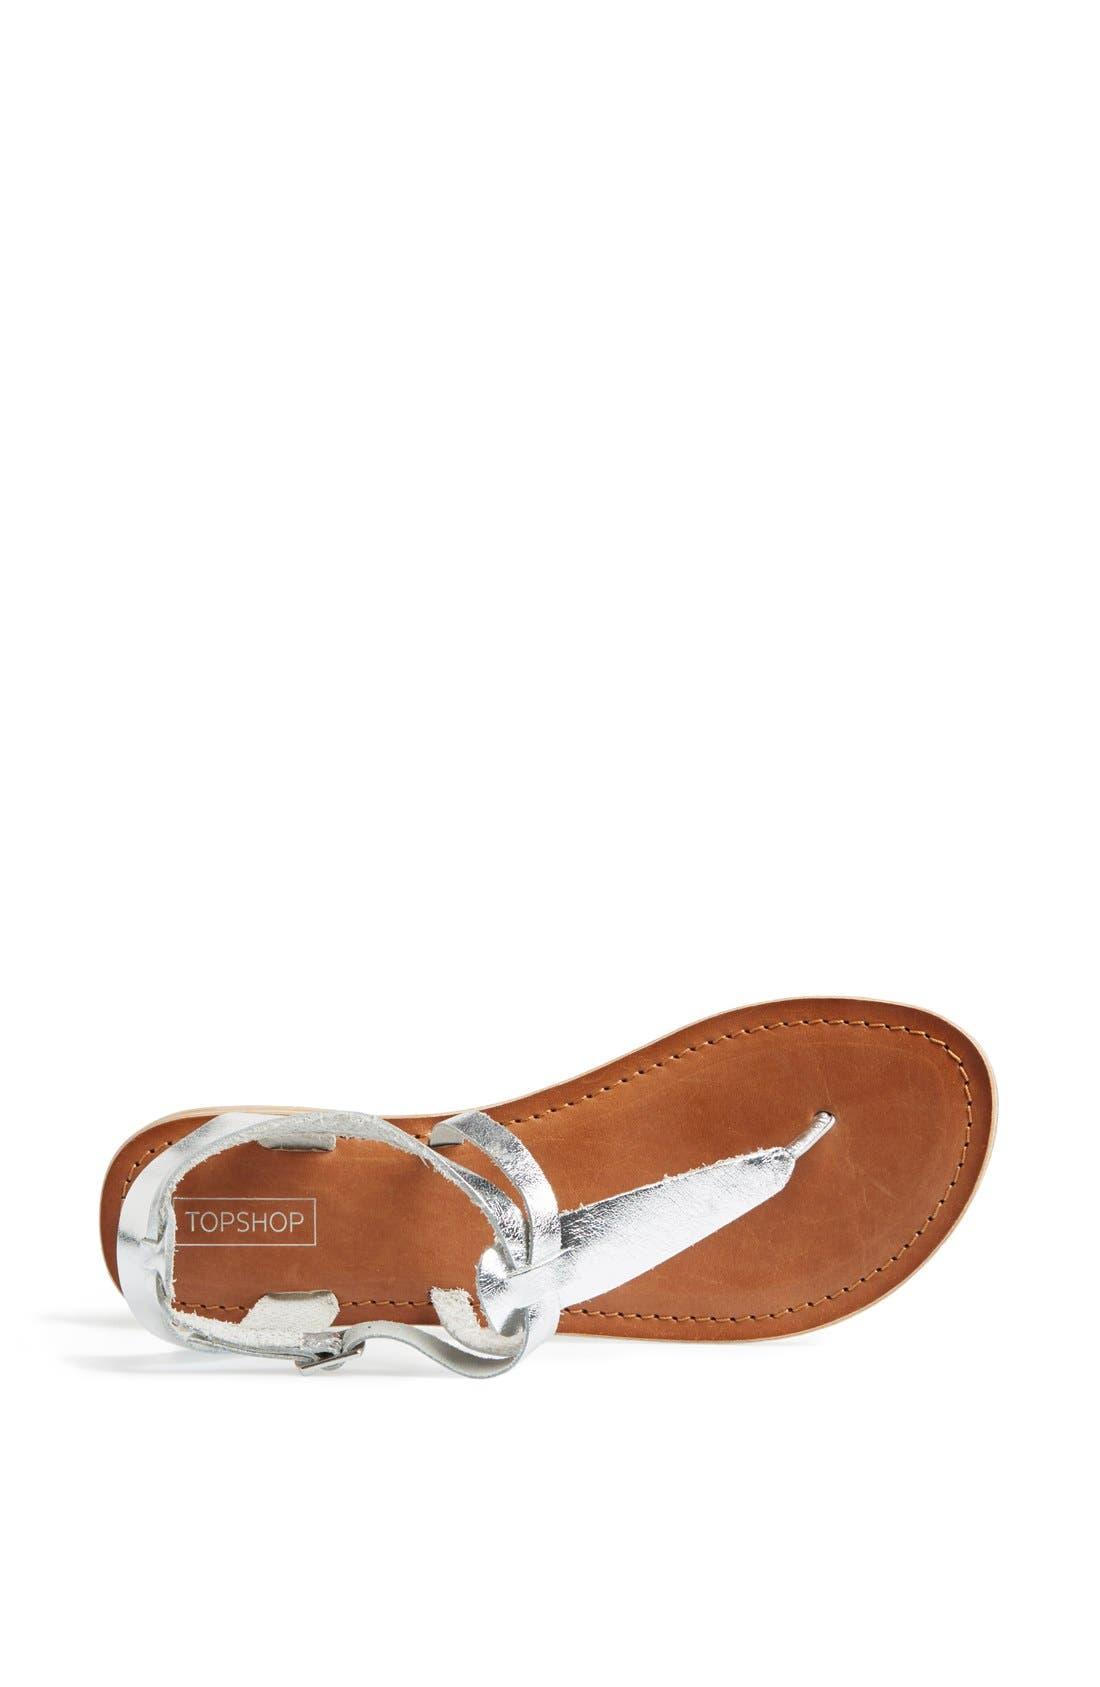 Alternate Image 3  - Topshop 'Horizon' Leather Sandal